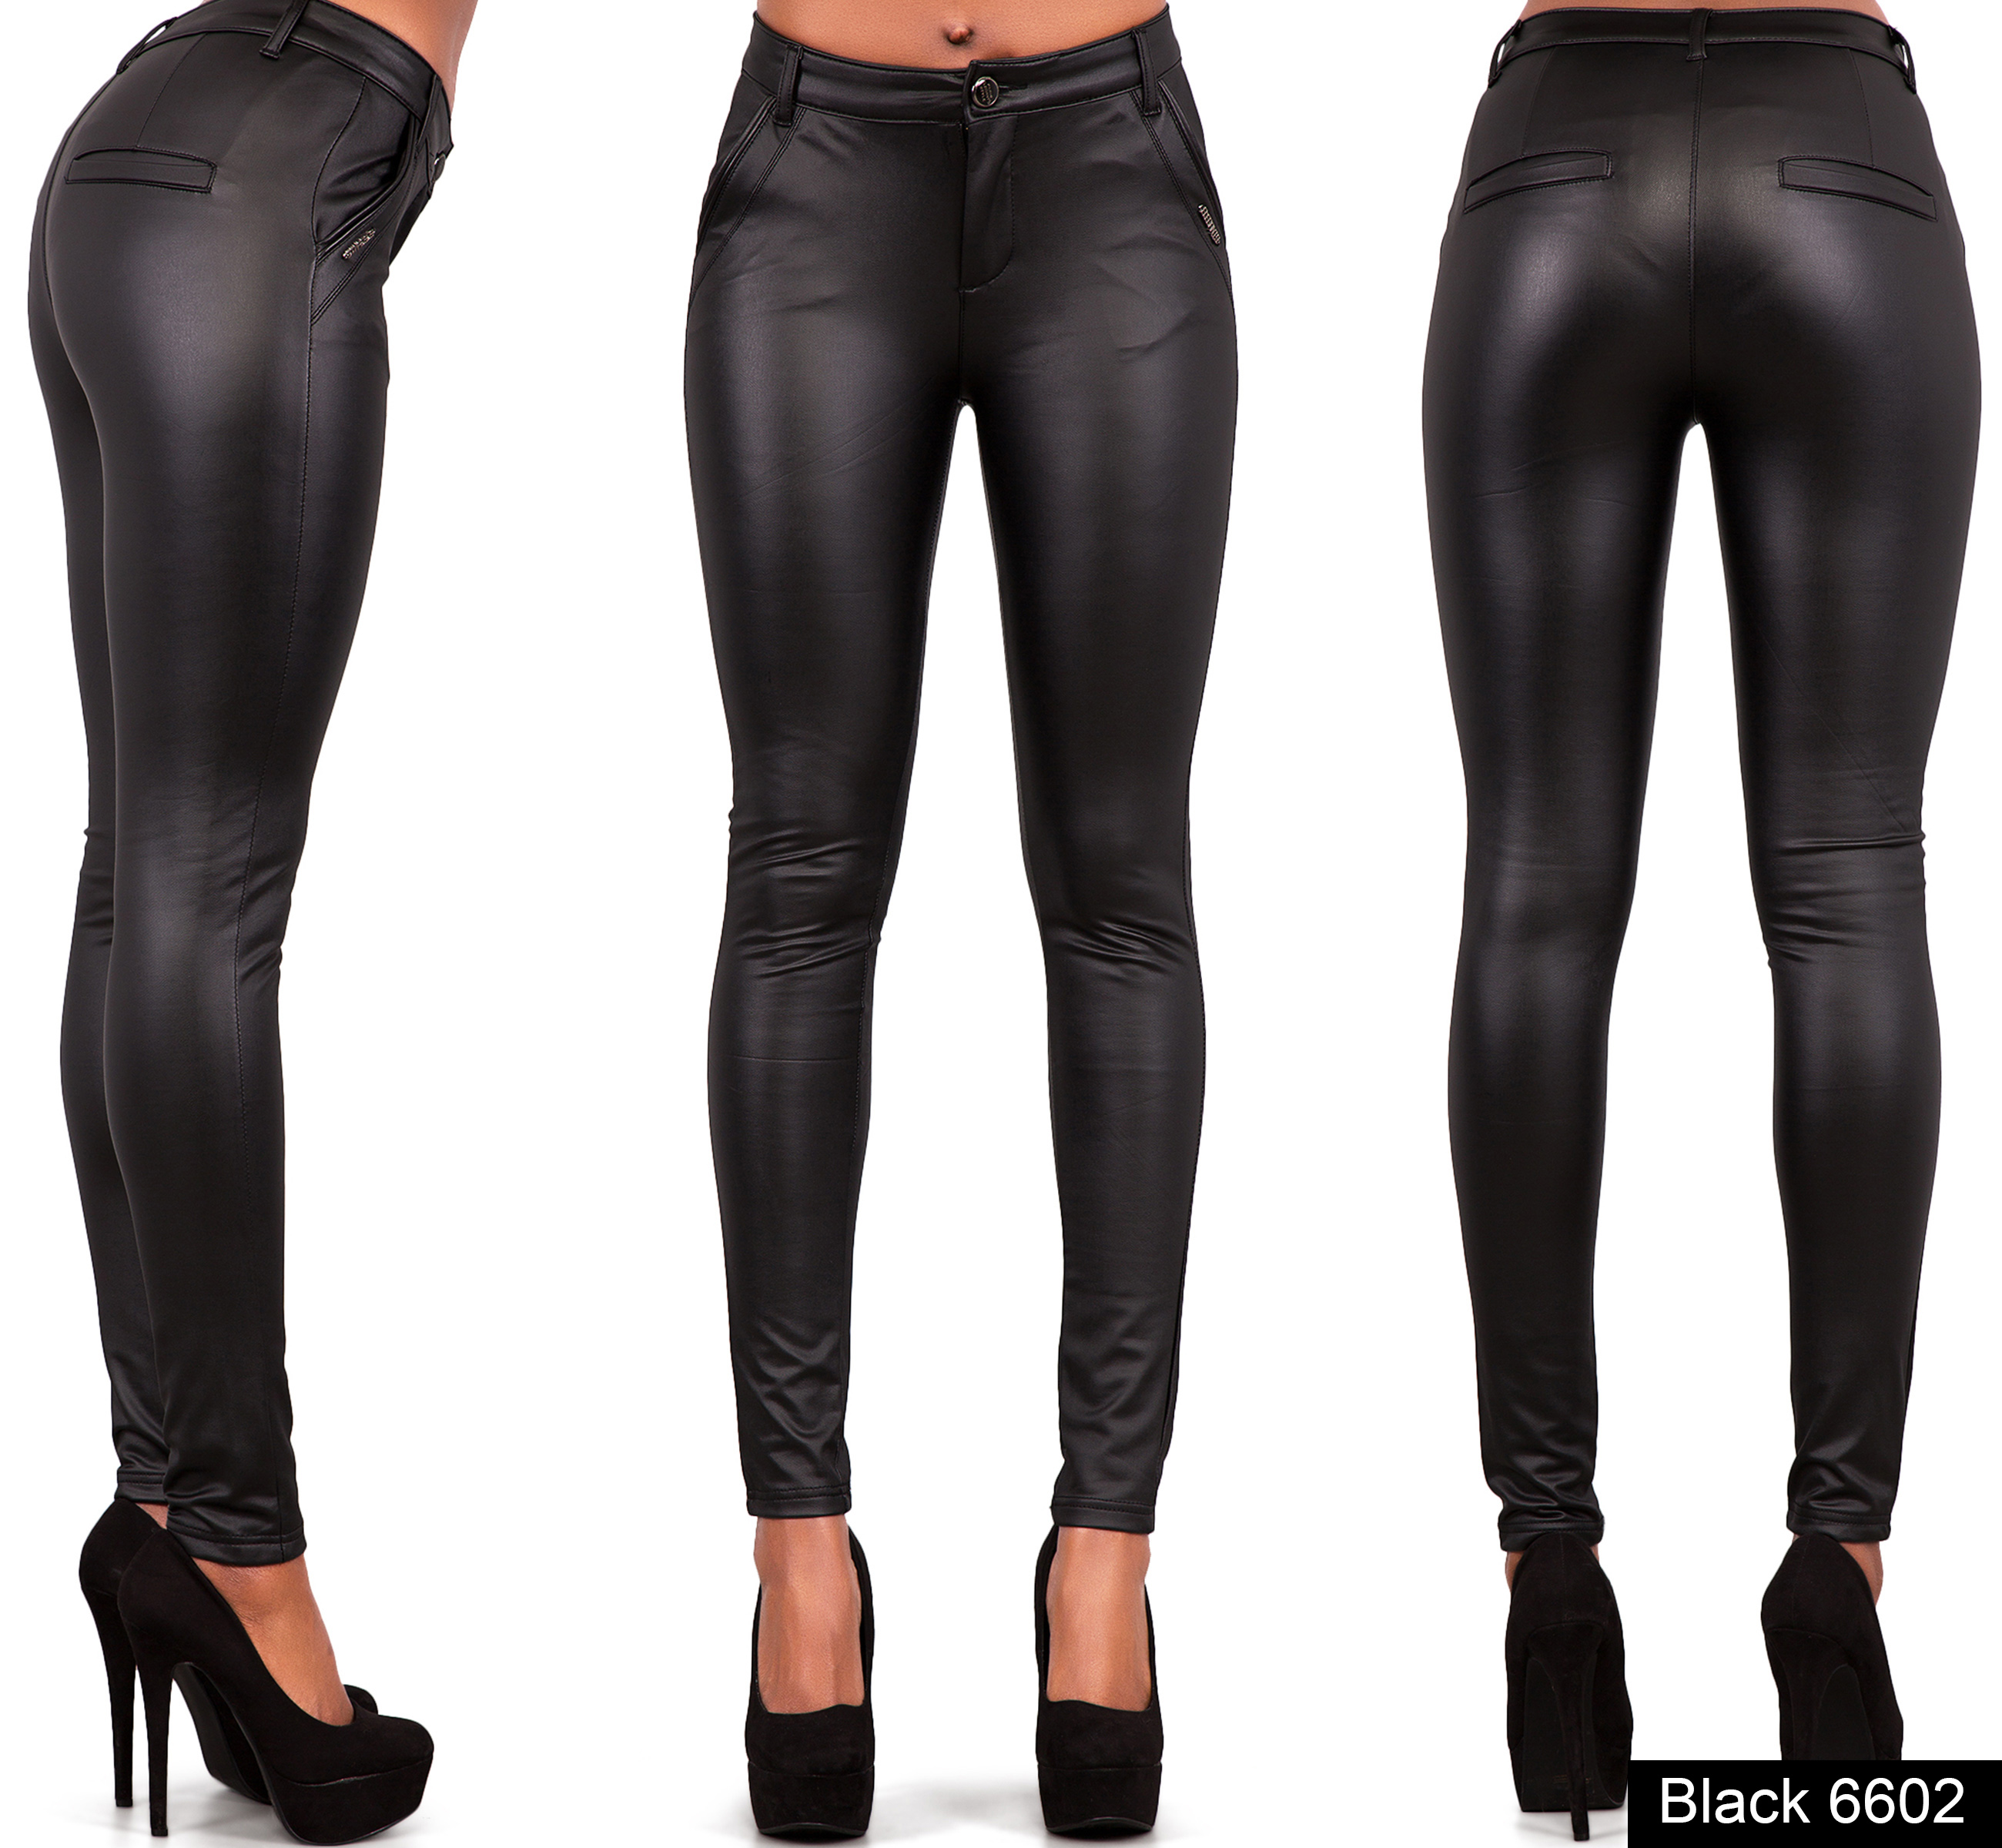 WOMEN LEATHER LOOK LEGGINGS TROUSERS BLACK WET LOOK JEANS ...